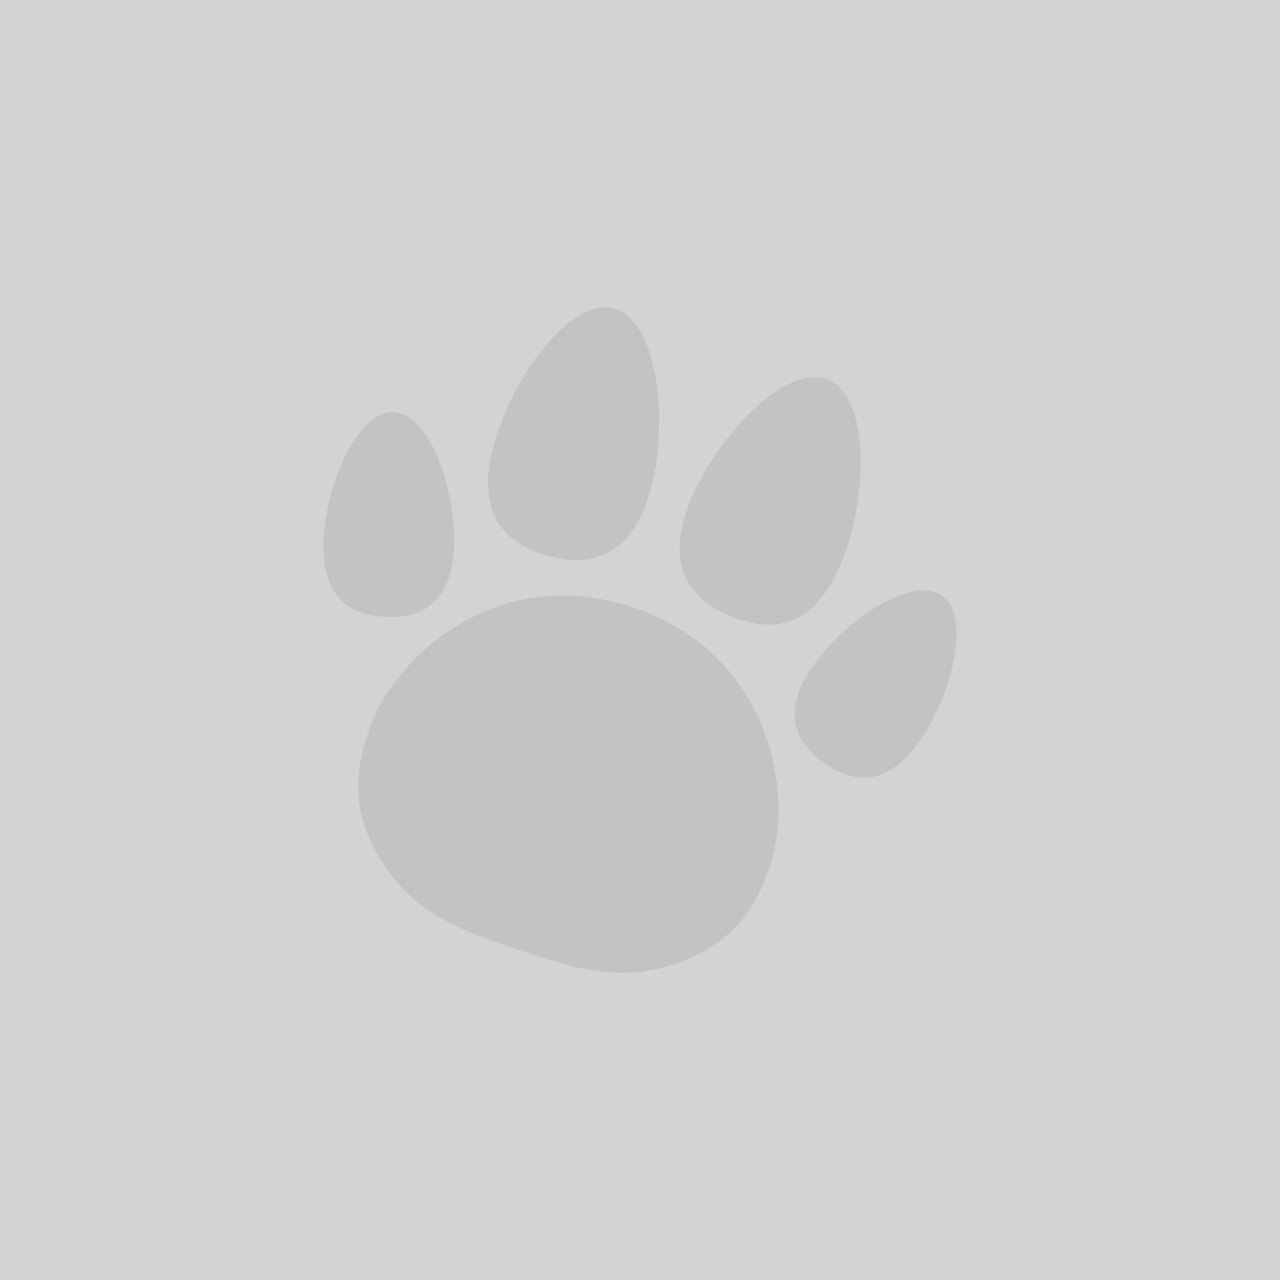 Rufus & Rosie Dog Lead Teal & Grey Large